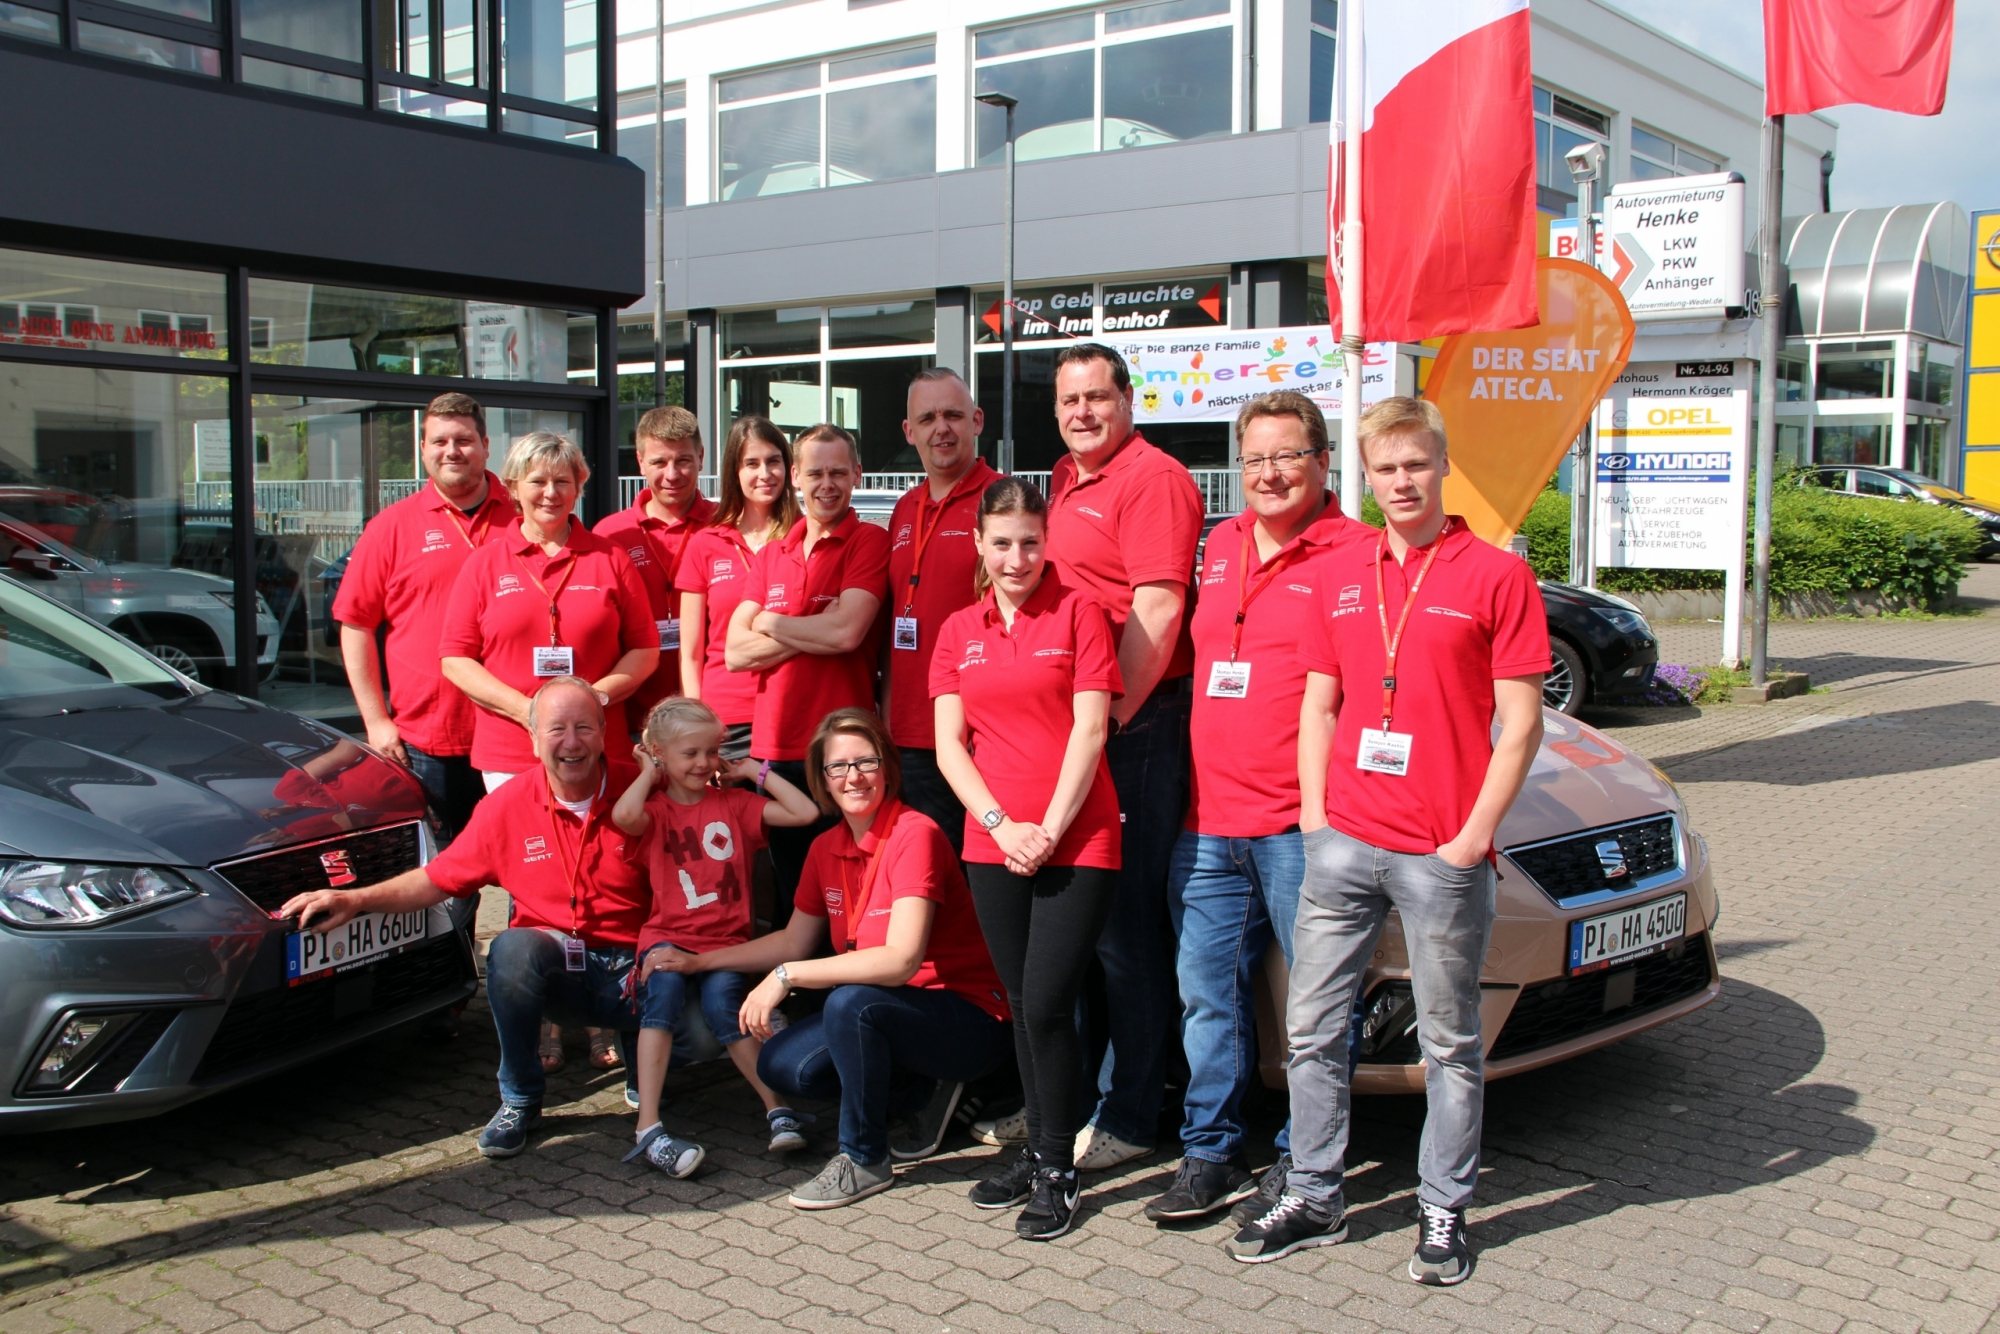 Seat Wedel Hamburg - Rückblick Sommerfest 2017 - Team